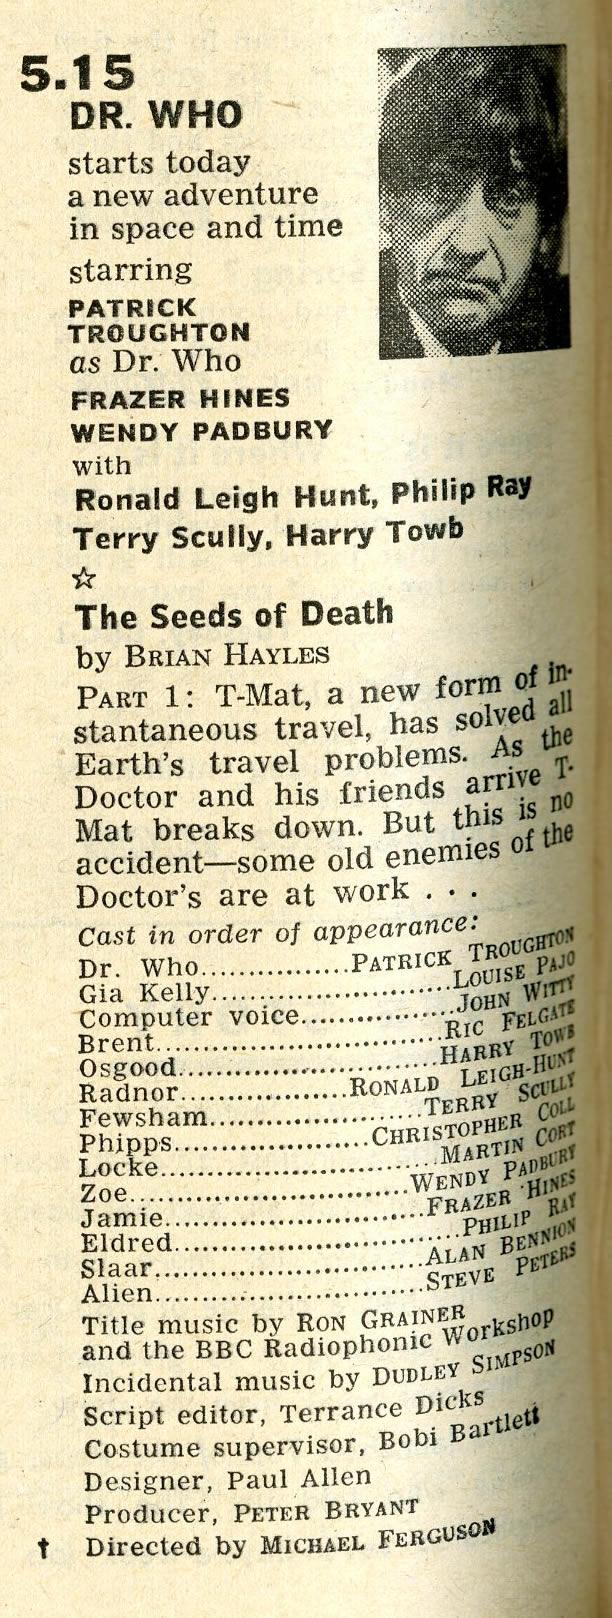 Radio Times, 25-31 January 1969